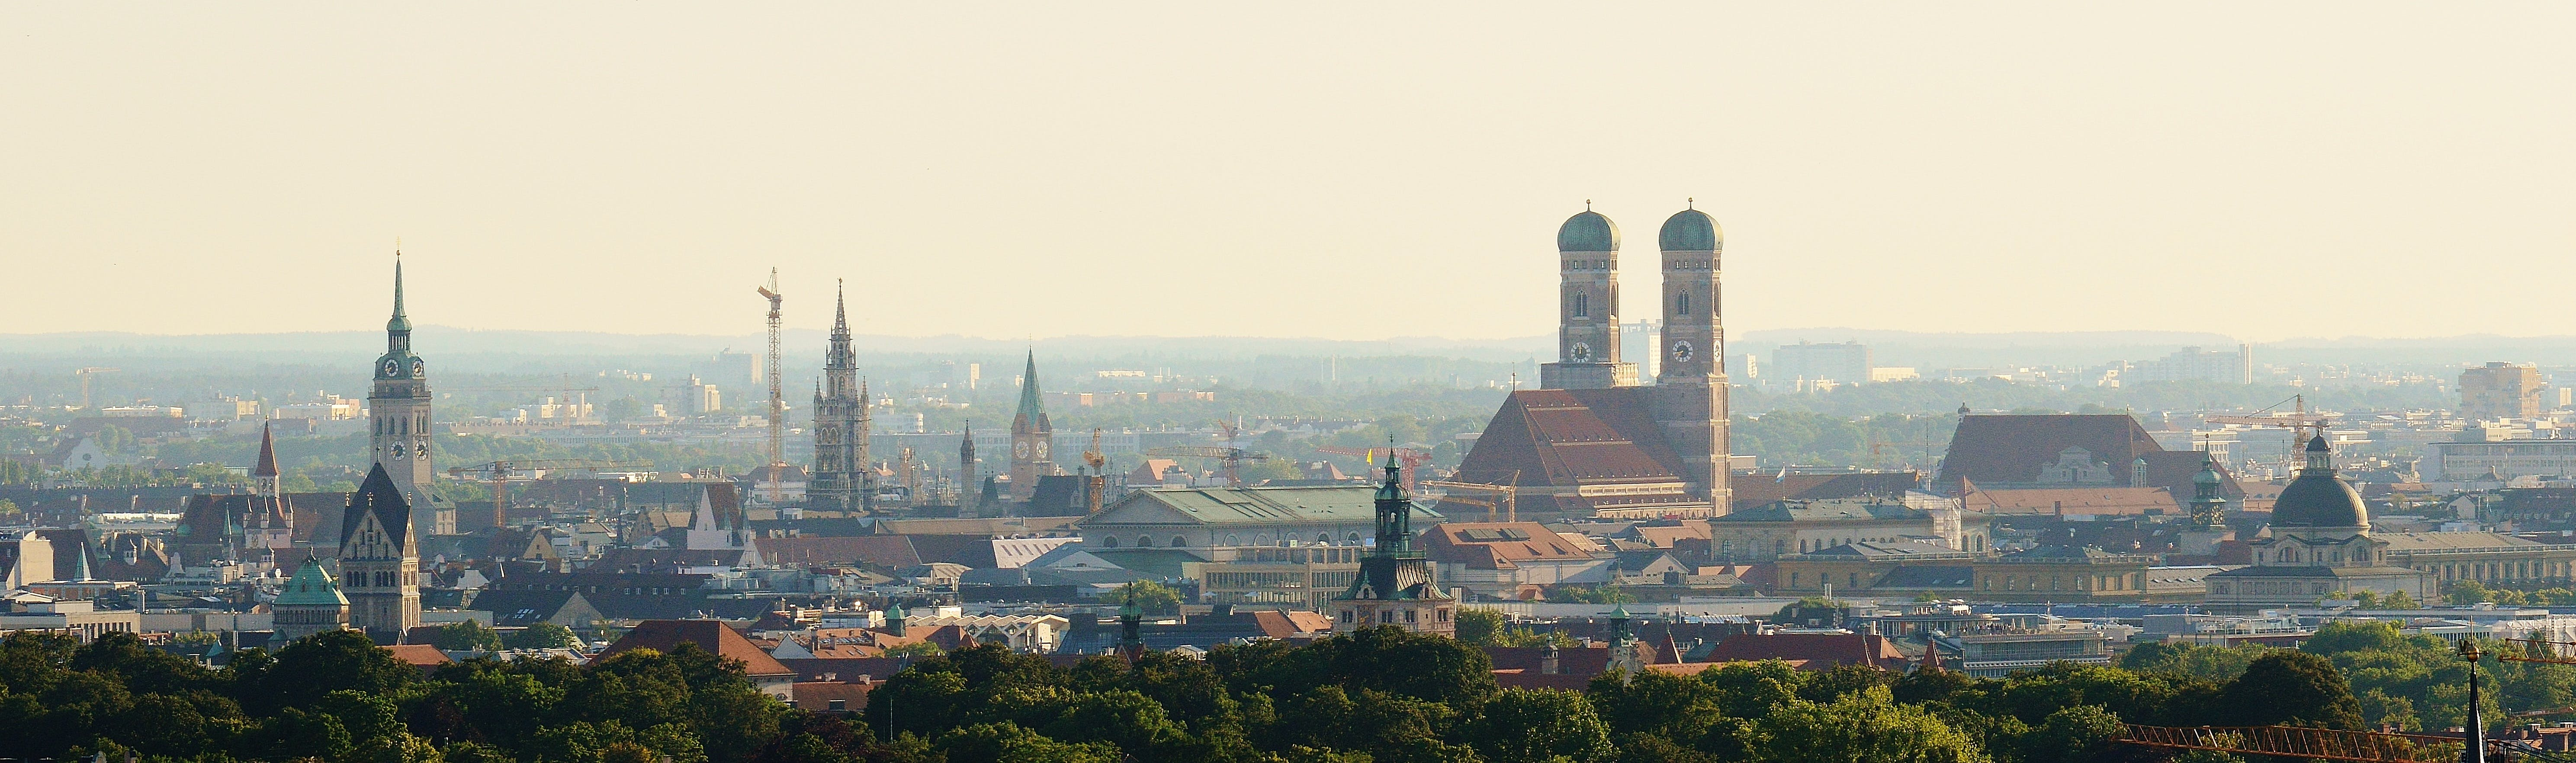 Free stock photo of city, landmark, building, church